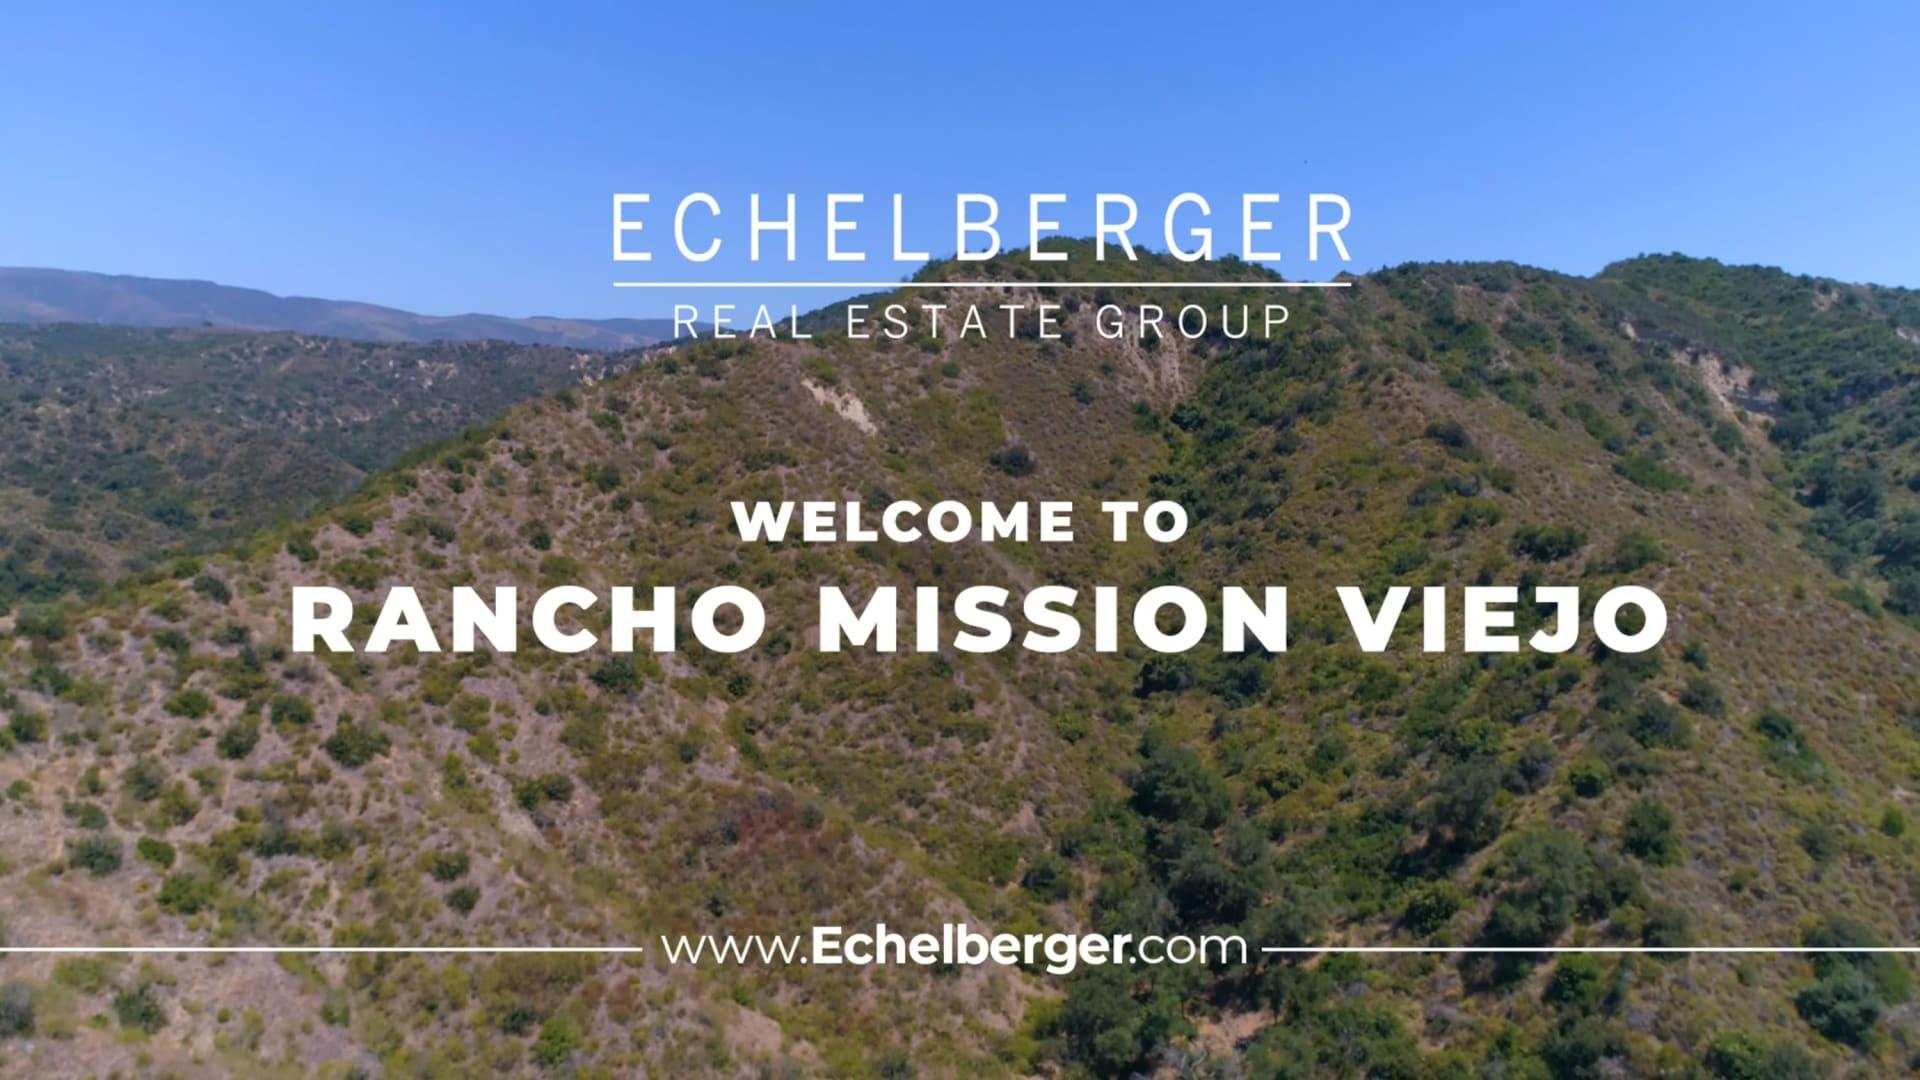 Rancho Mission Viejo video preview